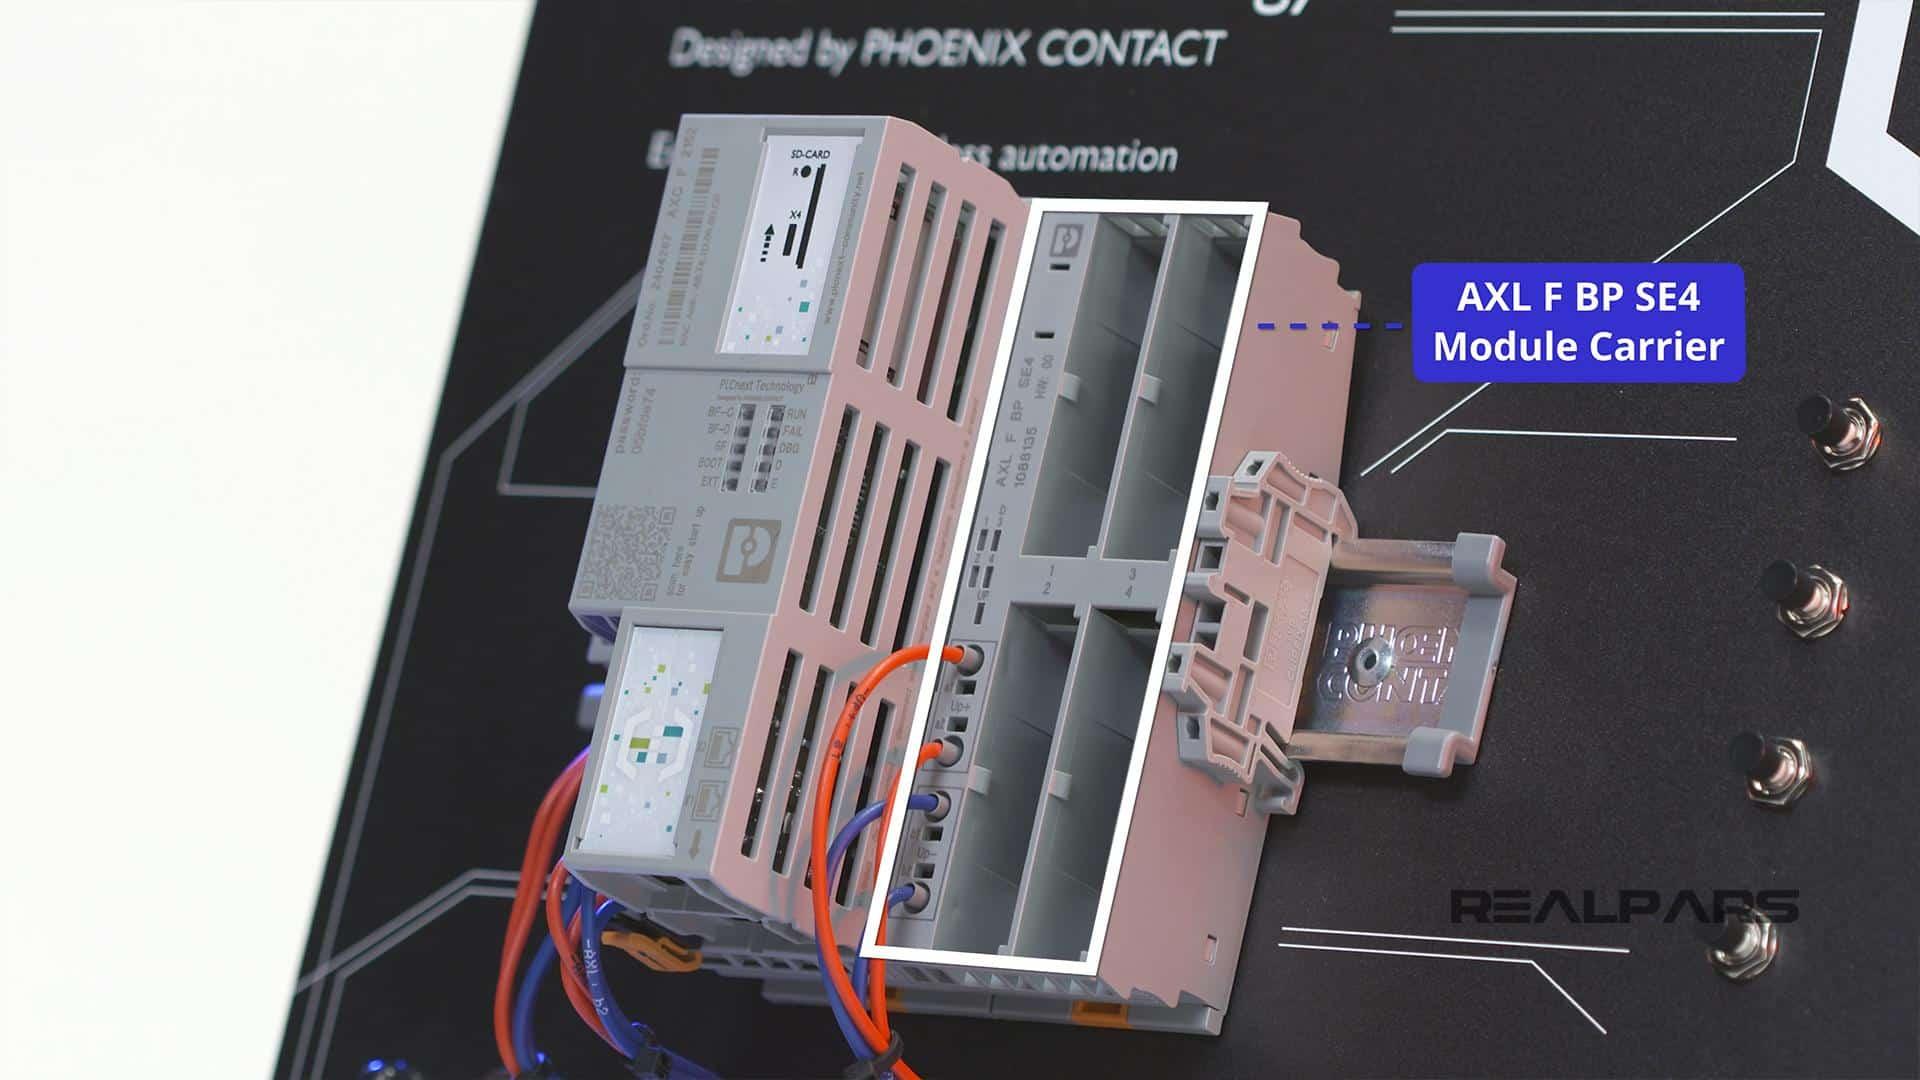 AXL F BP SE4 Module Carrier